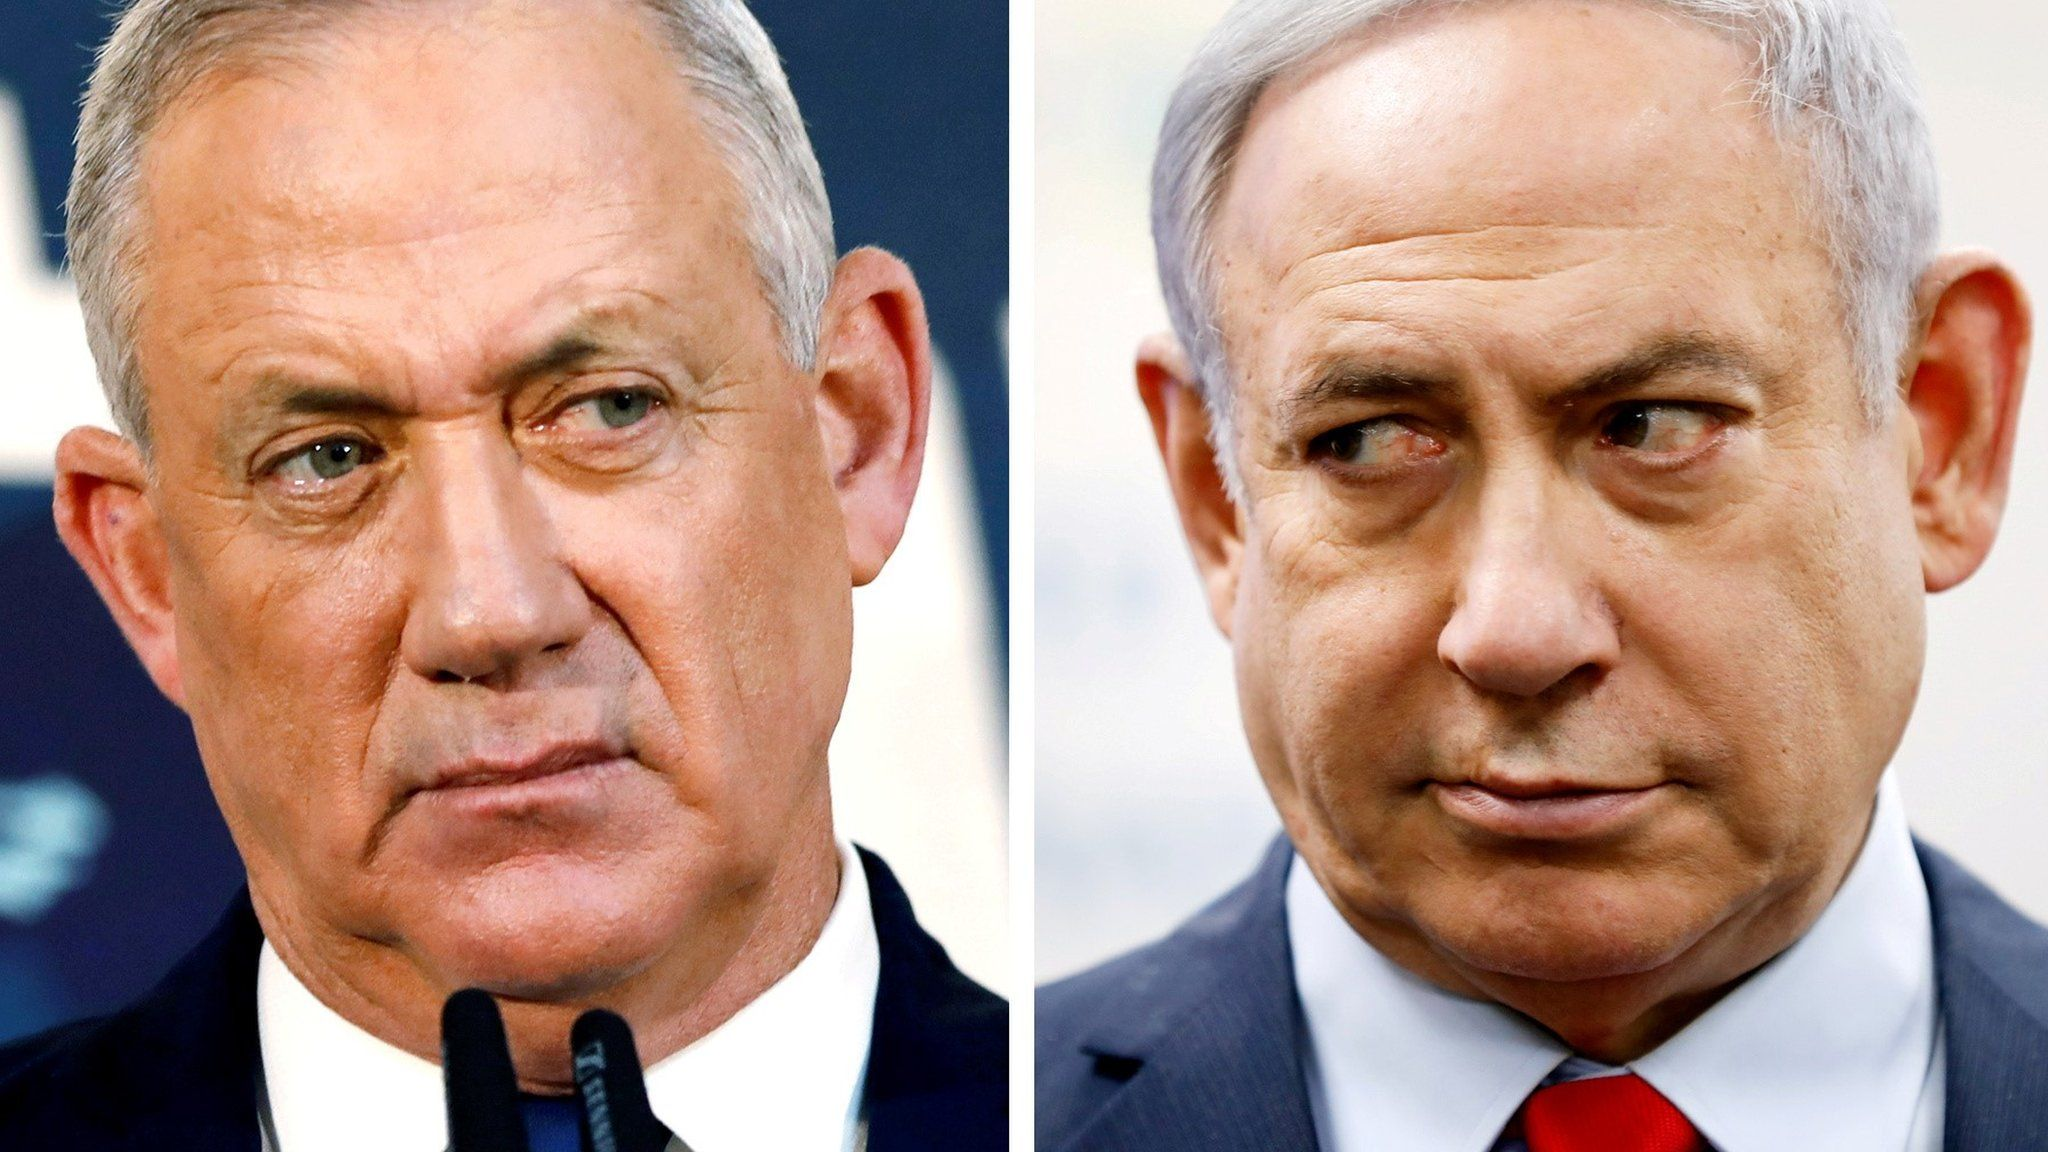 File photos of Benny Gantz (left) and Benjamin Netanyahu (right)